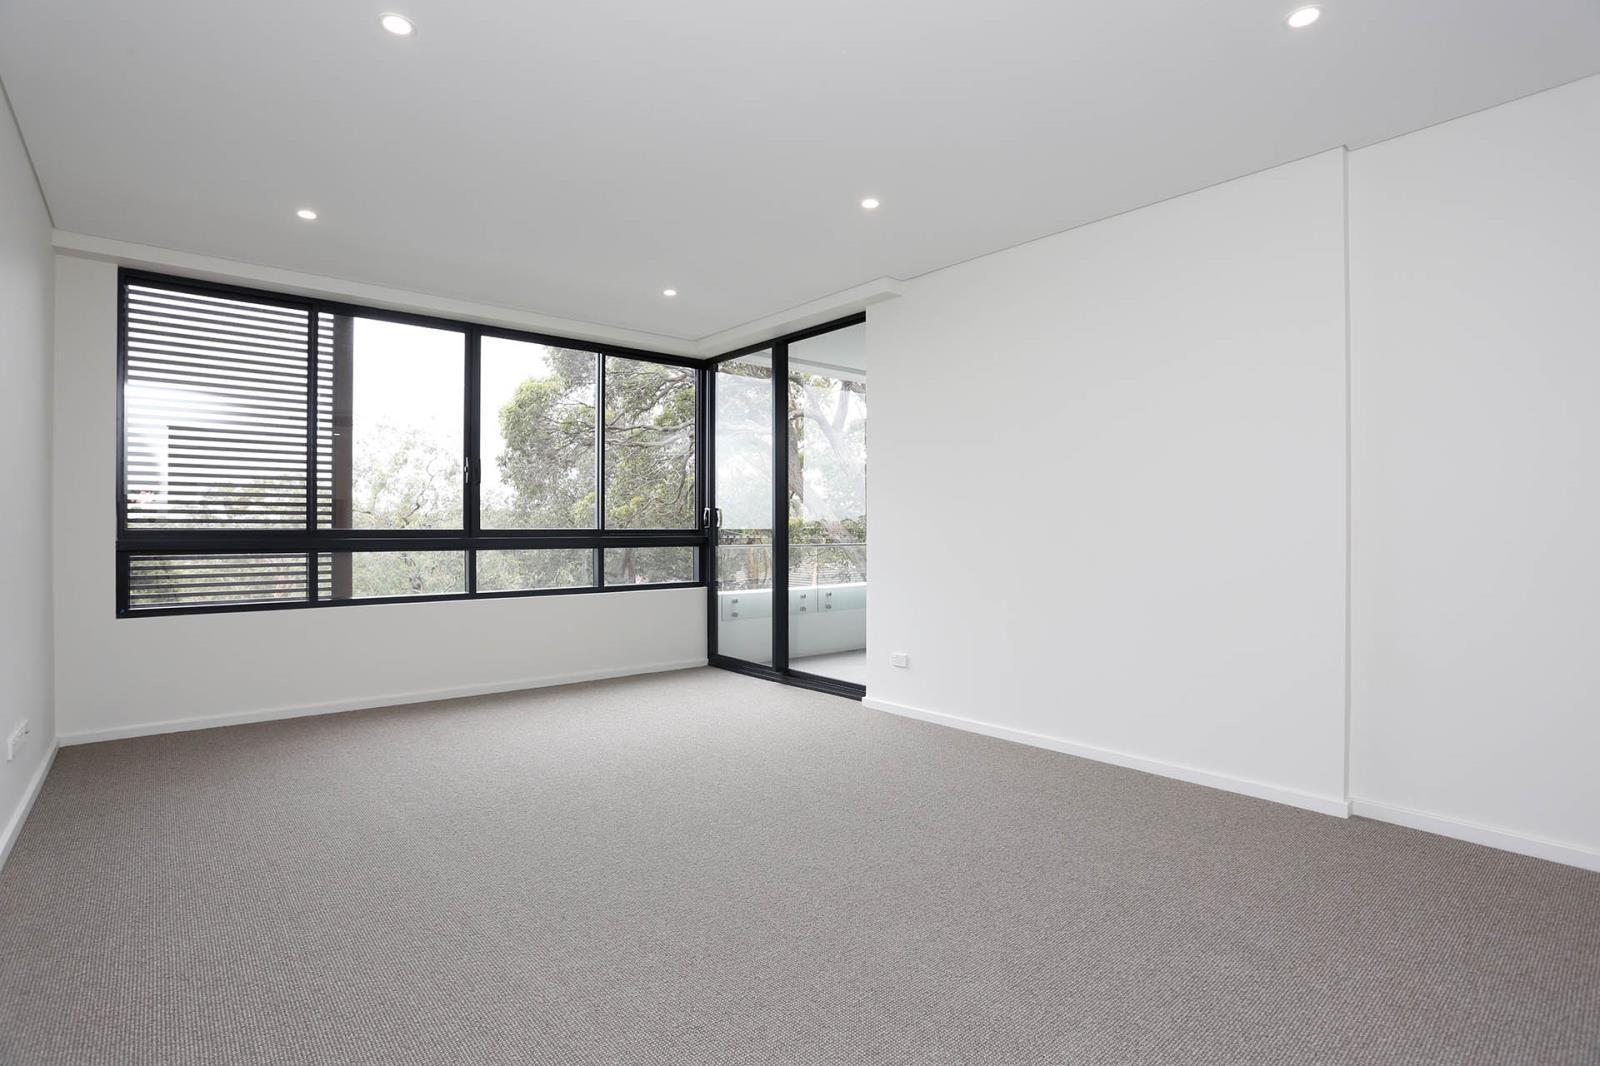 217/11 Veno Street, Heathcote NSW 2233, Image 2